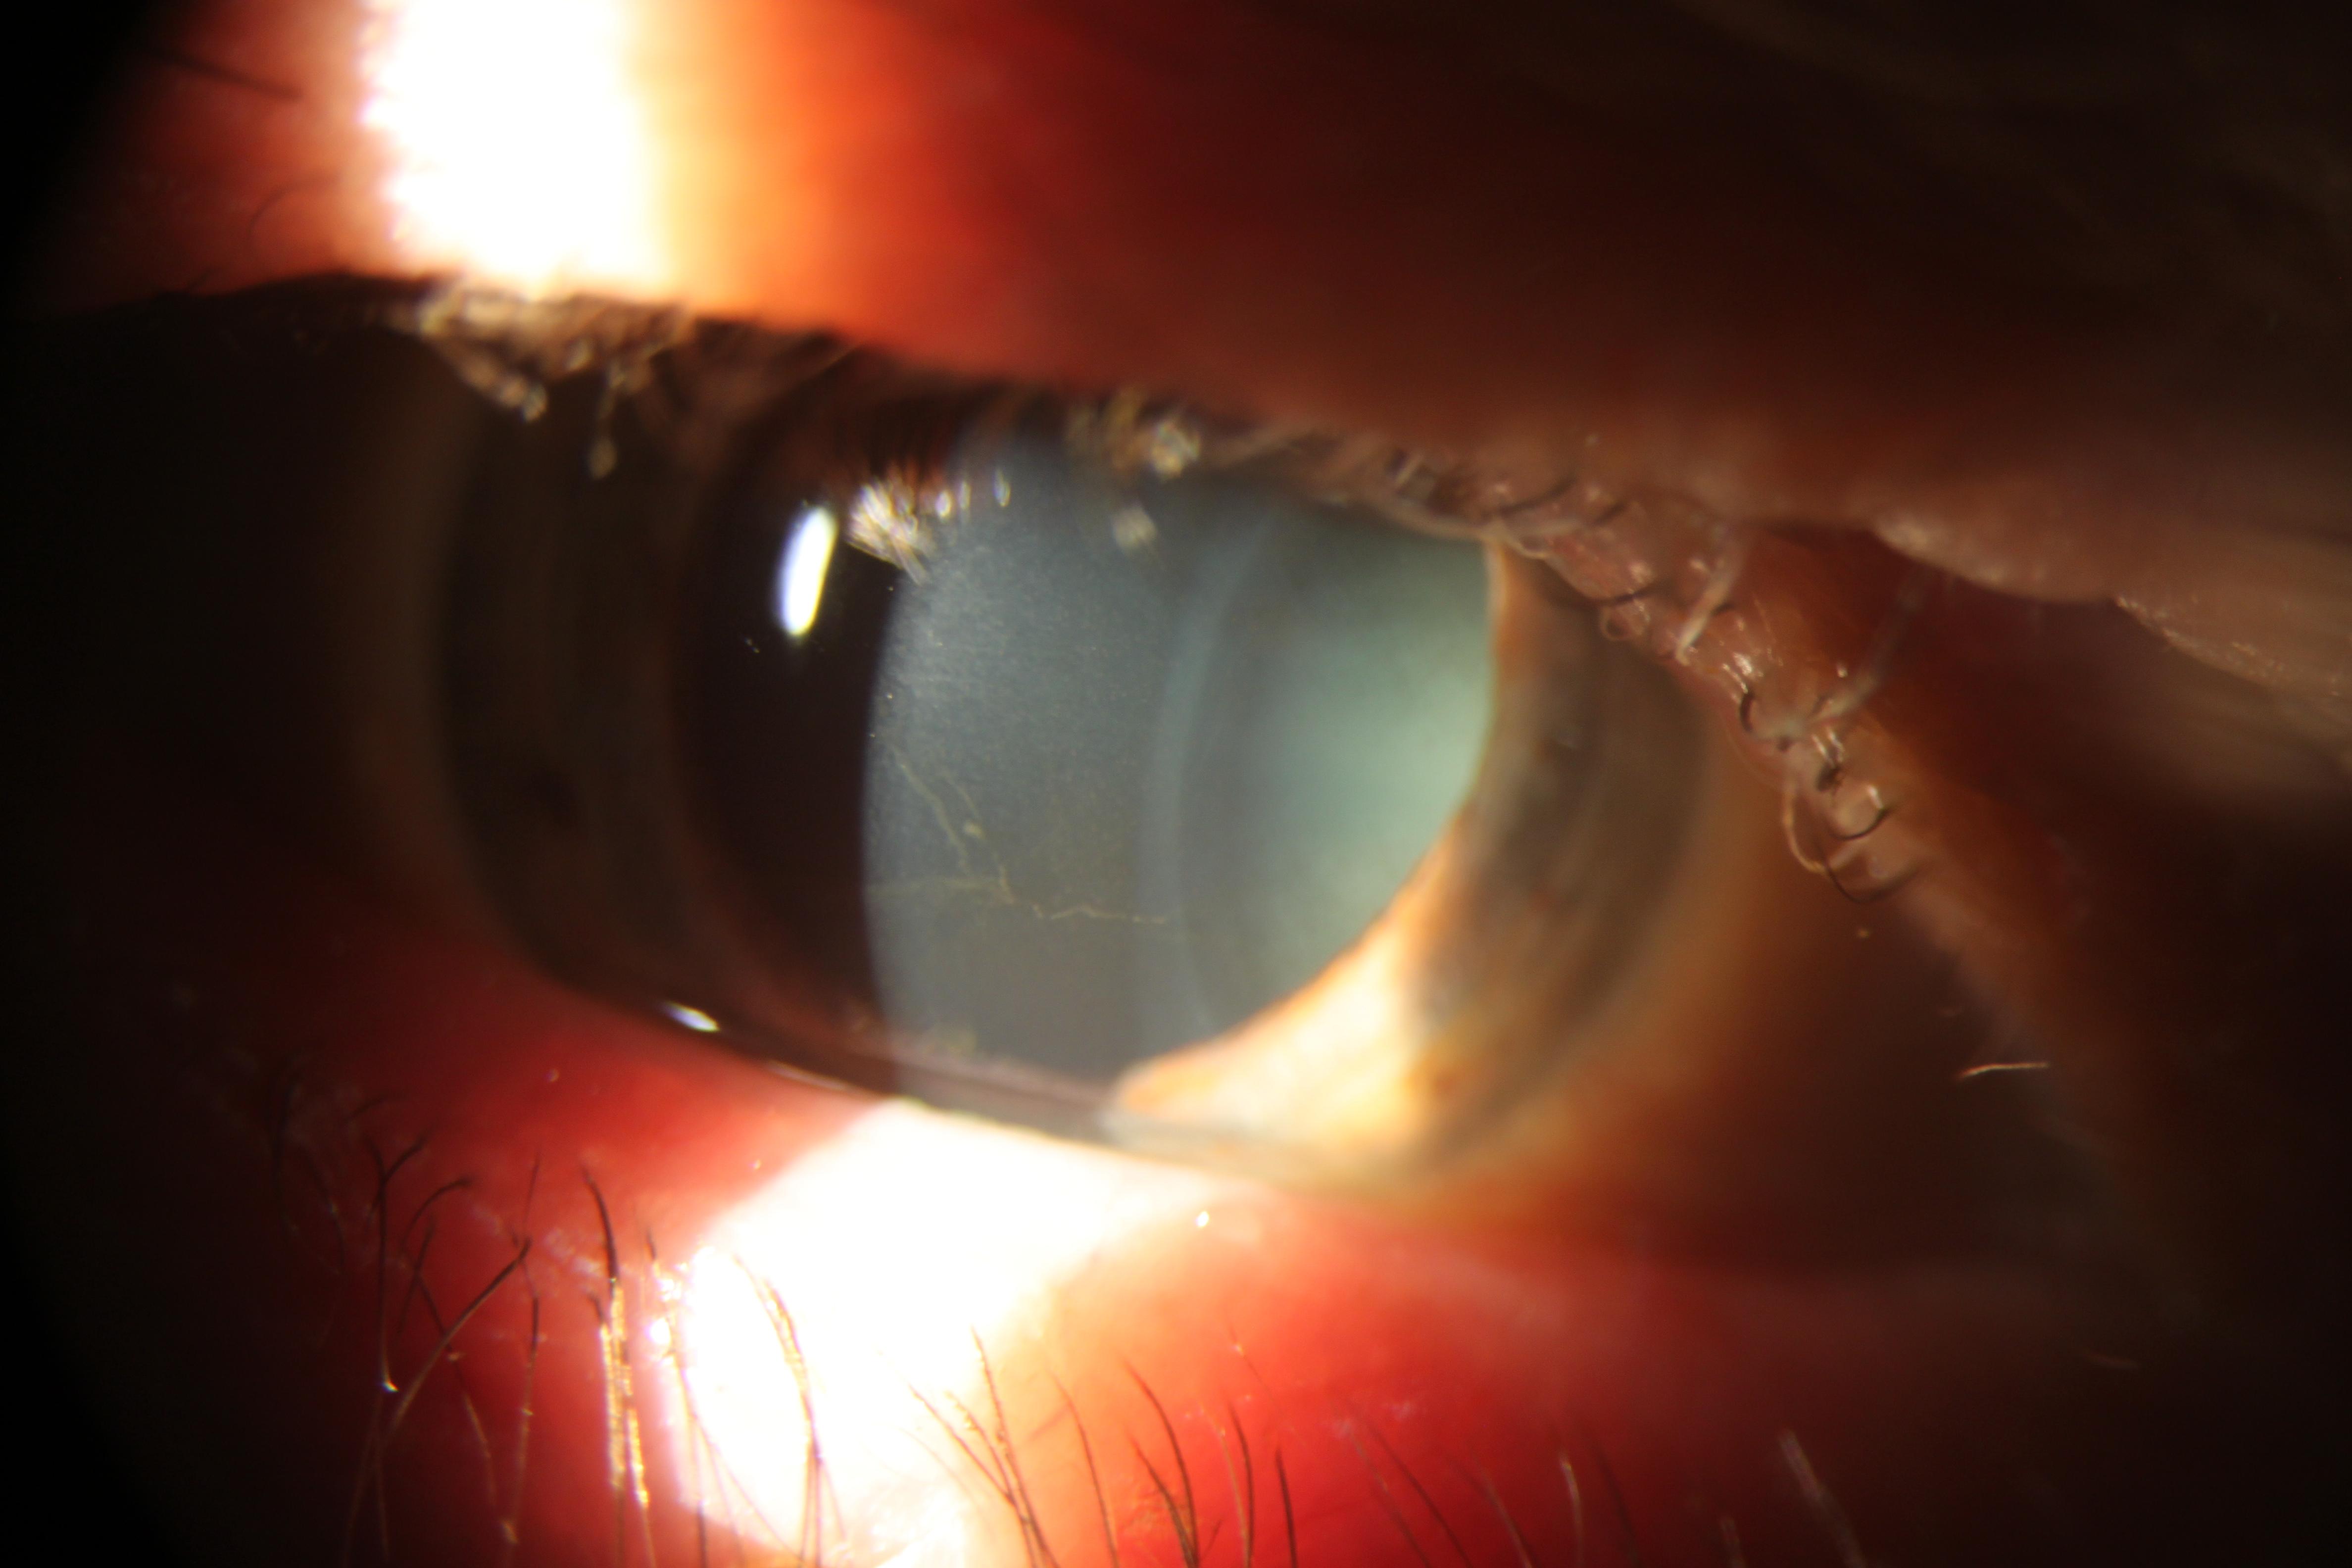 Corneal Verticillata American Academy Of Ophthalmology